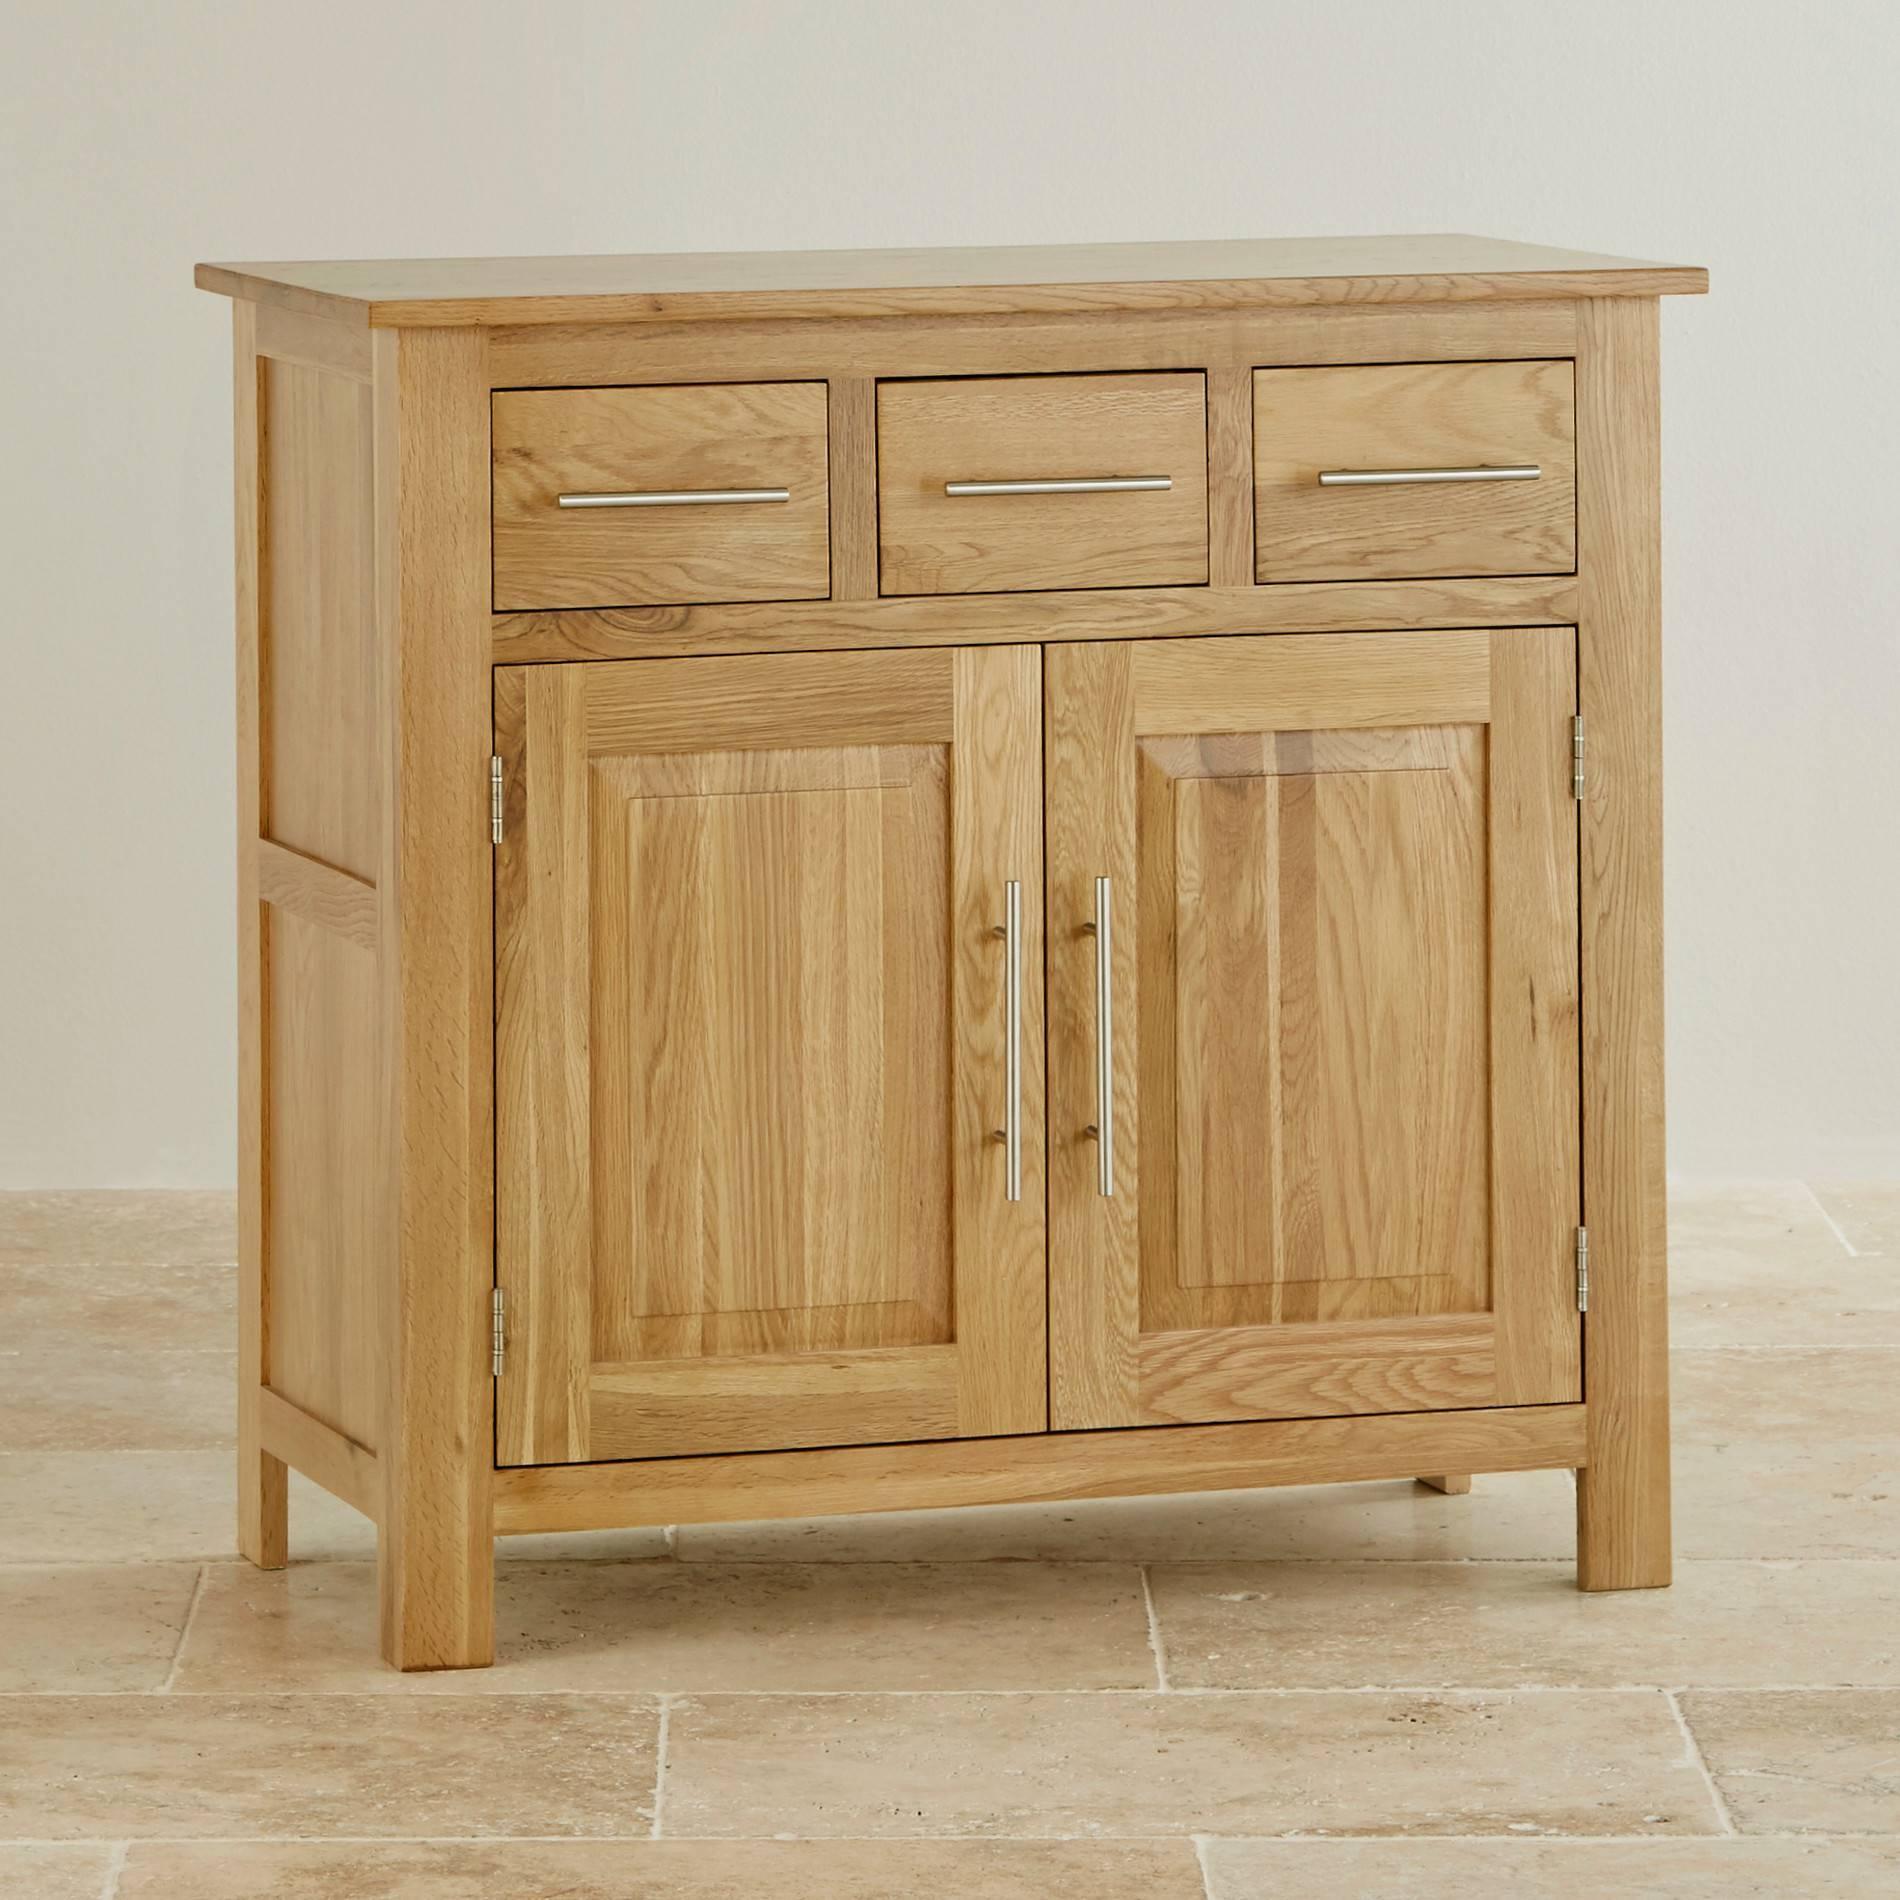 Sideboards | 100% Solid Hardwood | Oak Furniture Land Intended For Small Wooden Sideboard (#18 of 20)